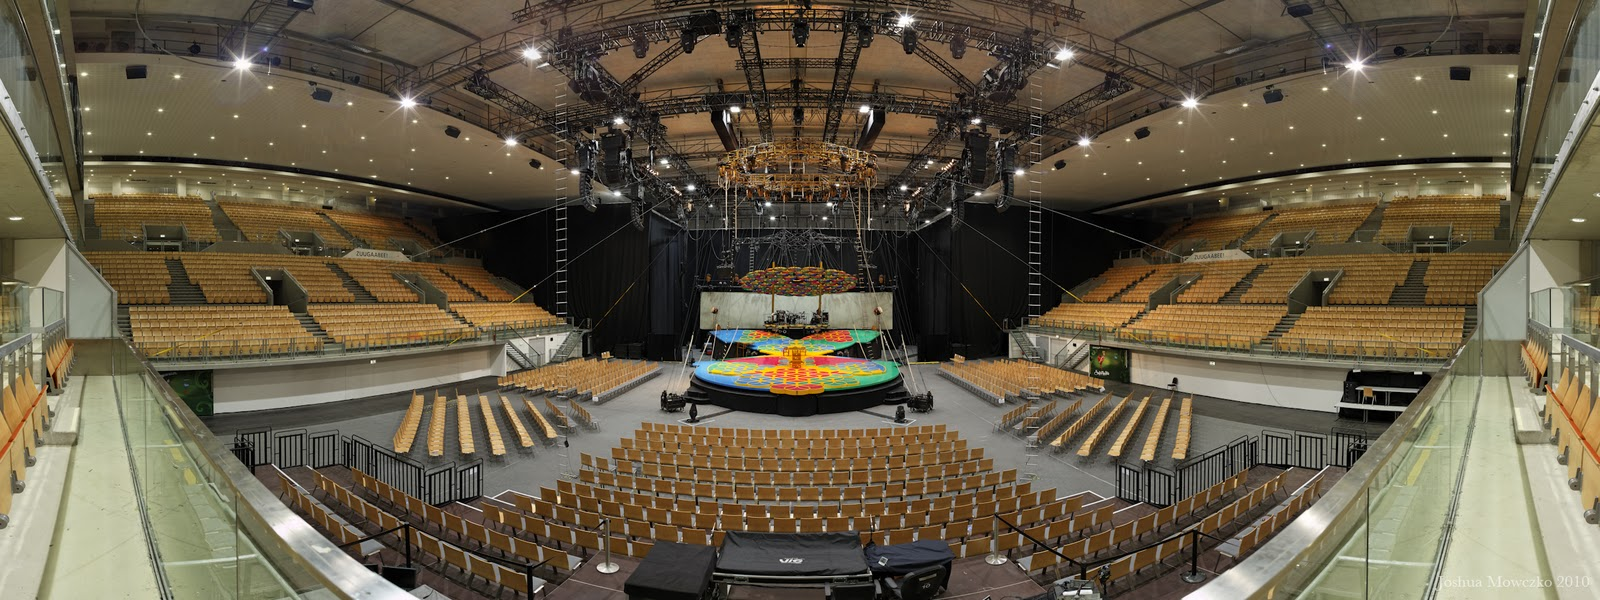 Life In The Circus Olympiahalle Innsbruck Austria